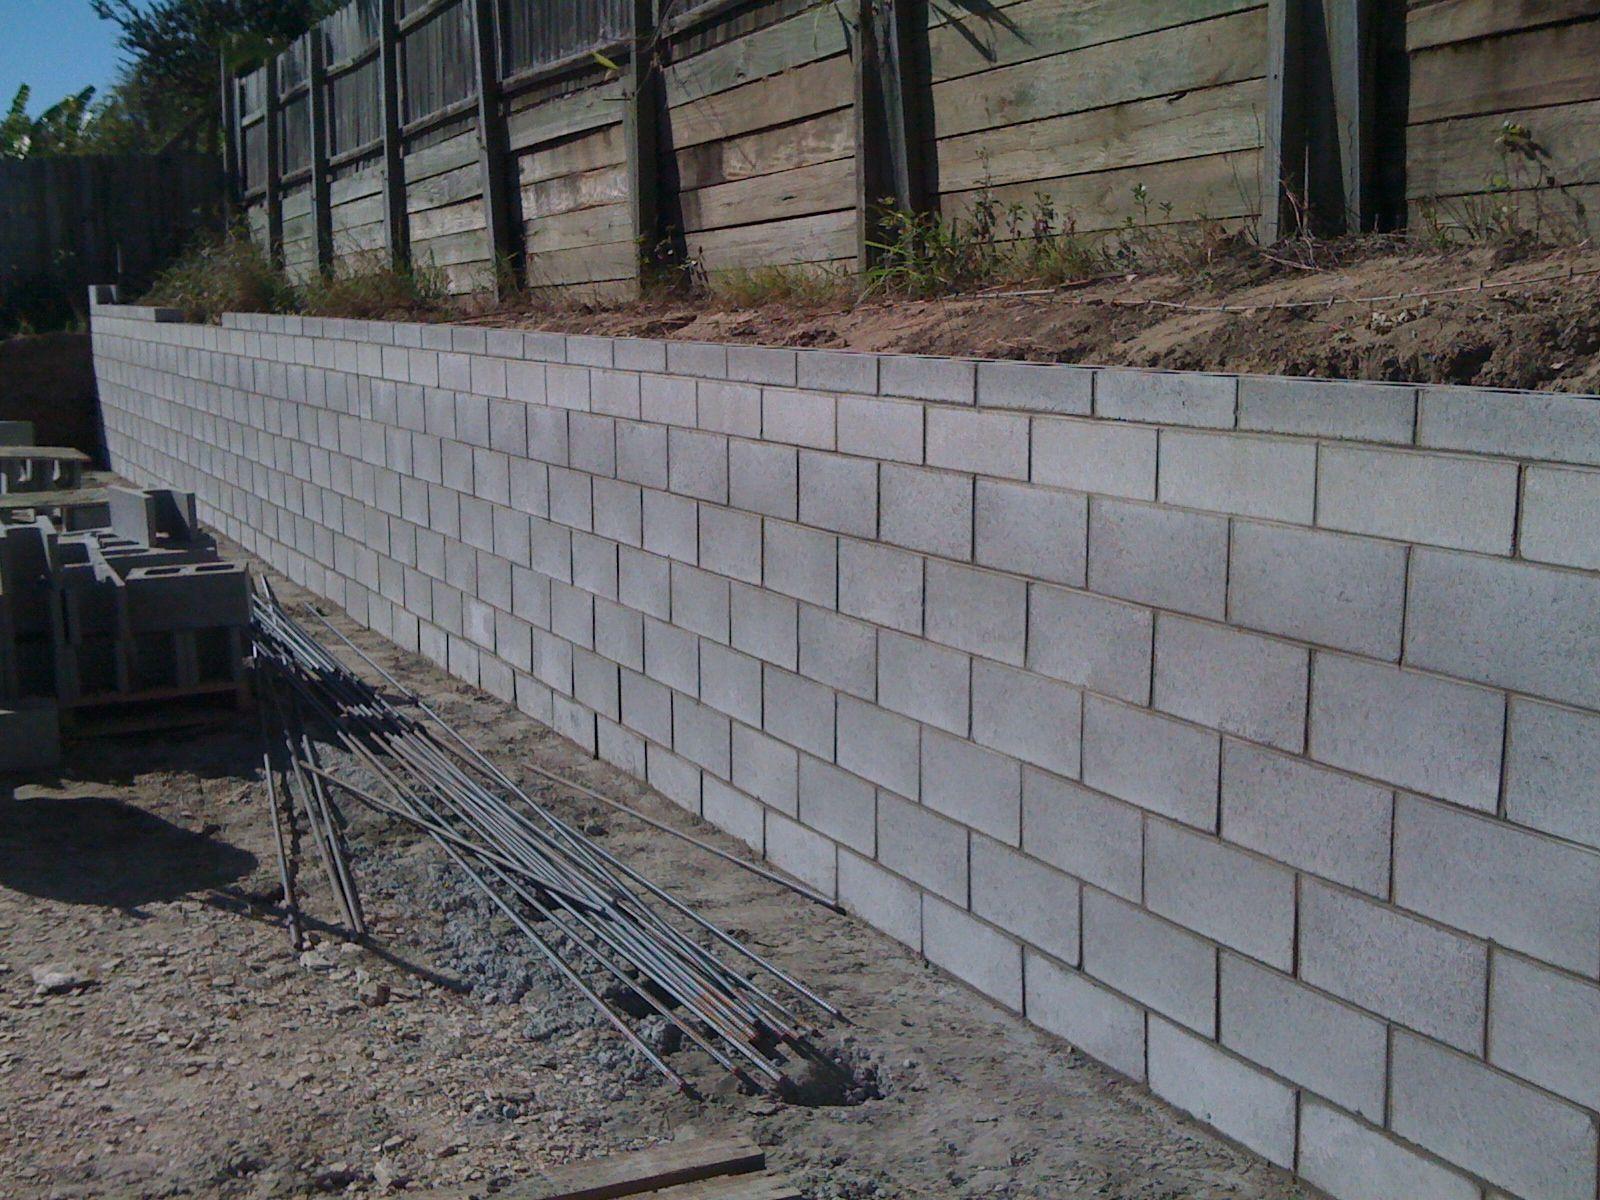 Cinder Block Retaining Wall Design Narrow Home Design Concrete Concrete Block Retaining Wall Cheap Retaining Wall Concrete Retaining Walls